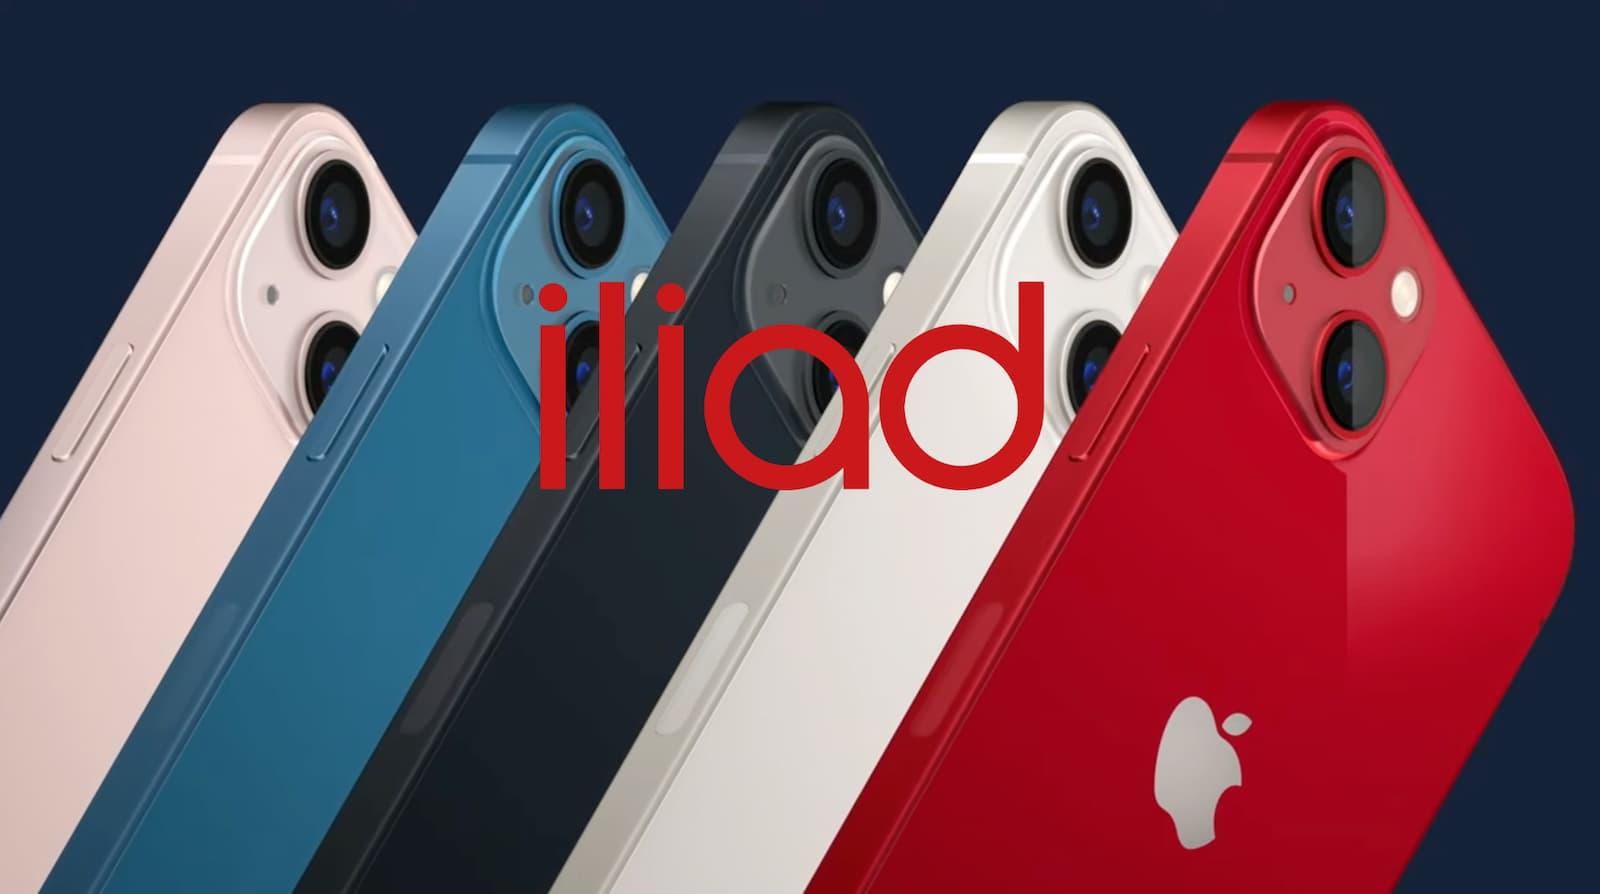 iPhone 13 iliad